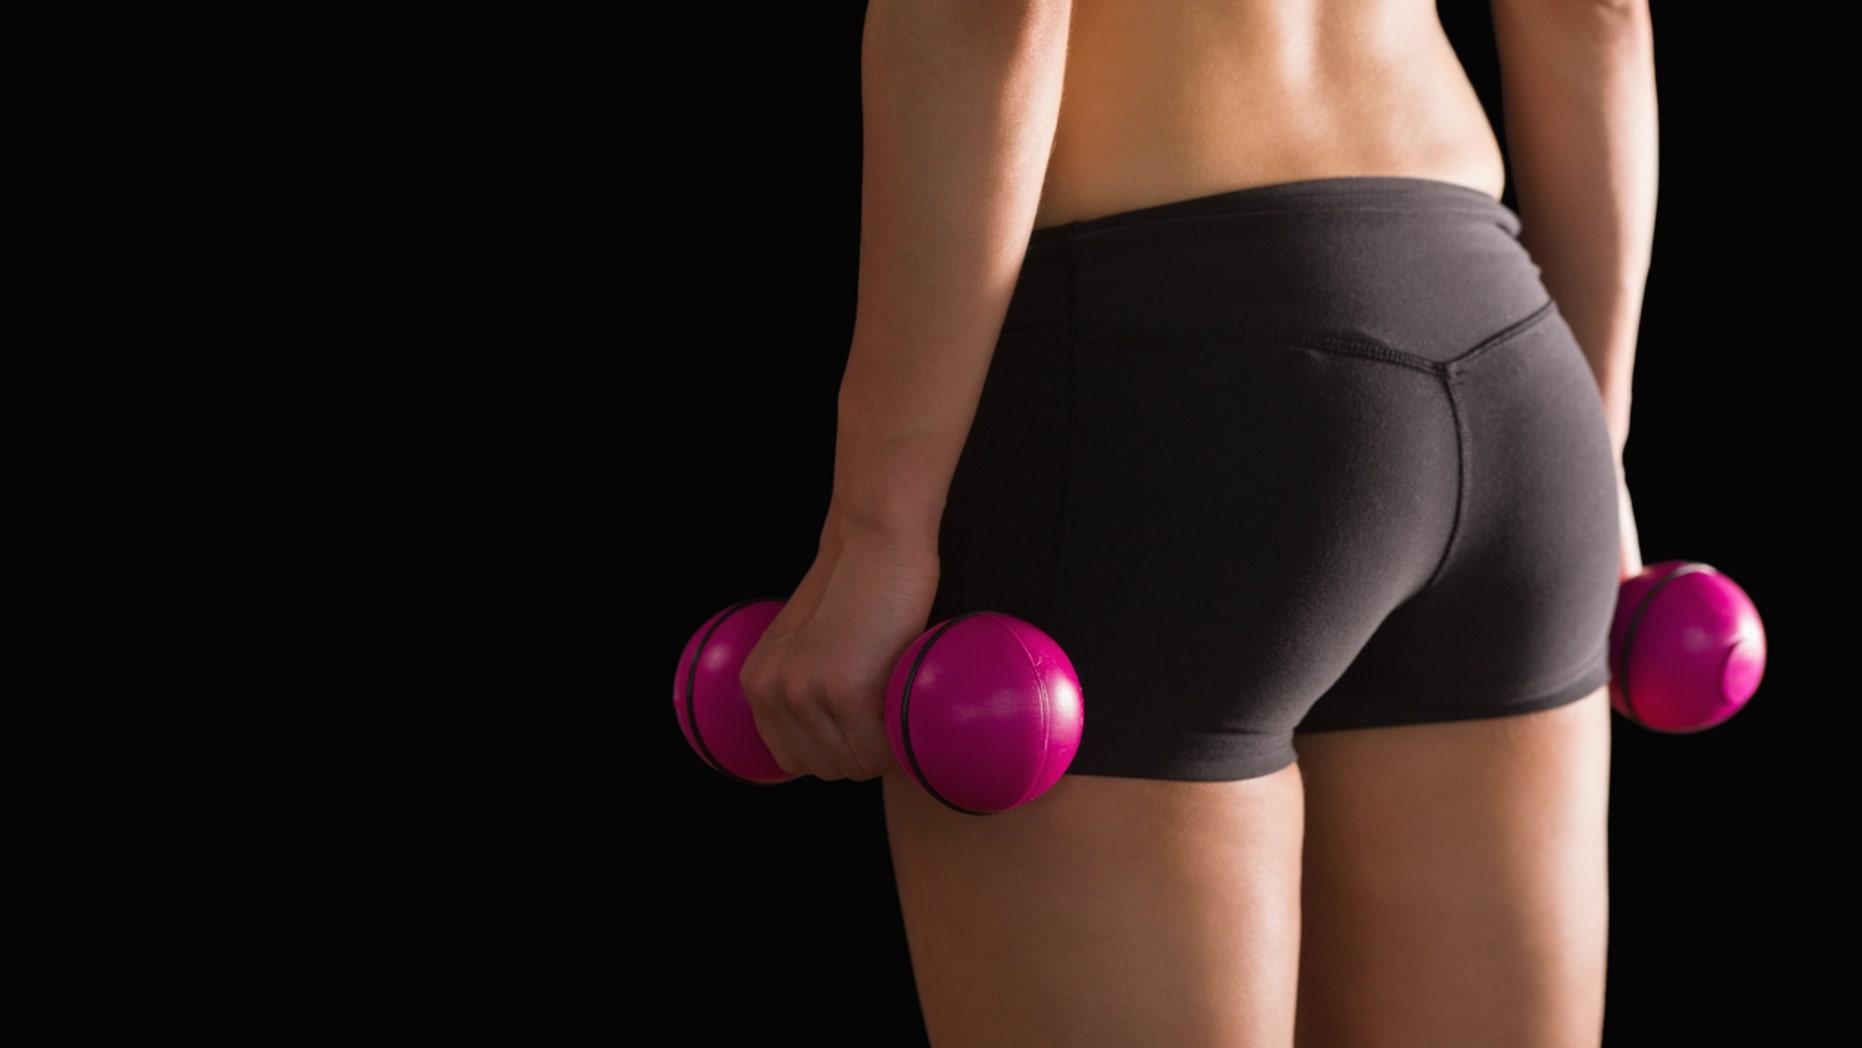 Rear view of slim woman wearing sportswear holding pink dumbbells on black background